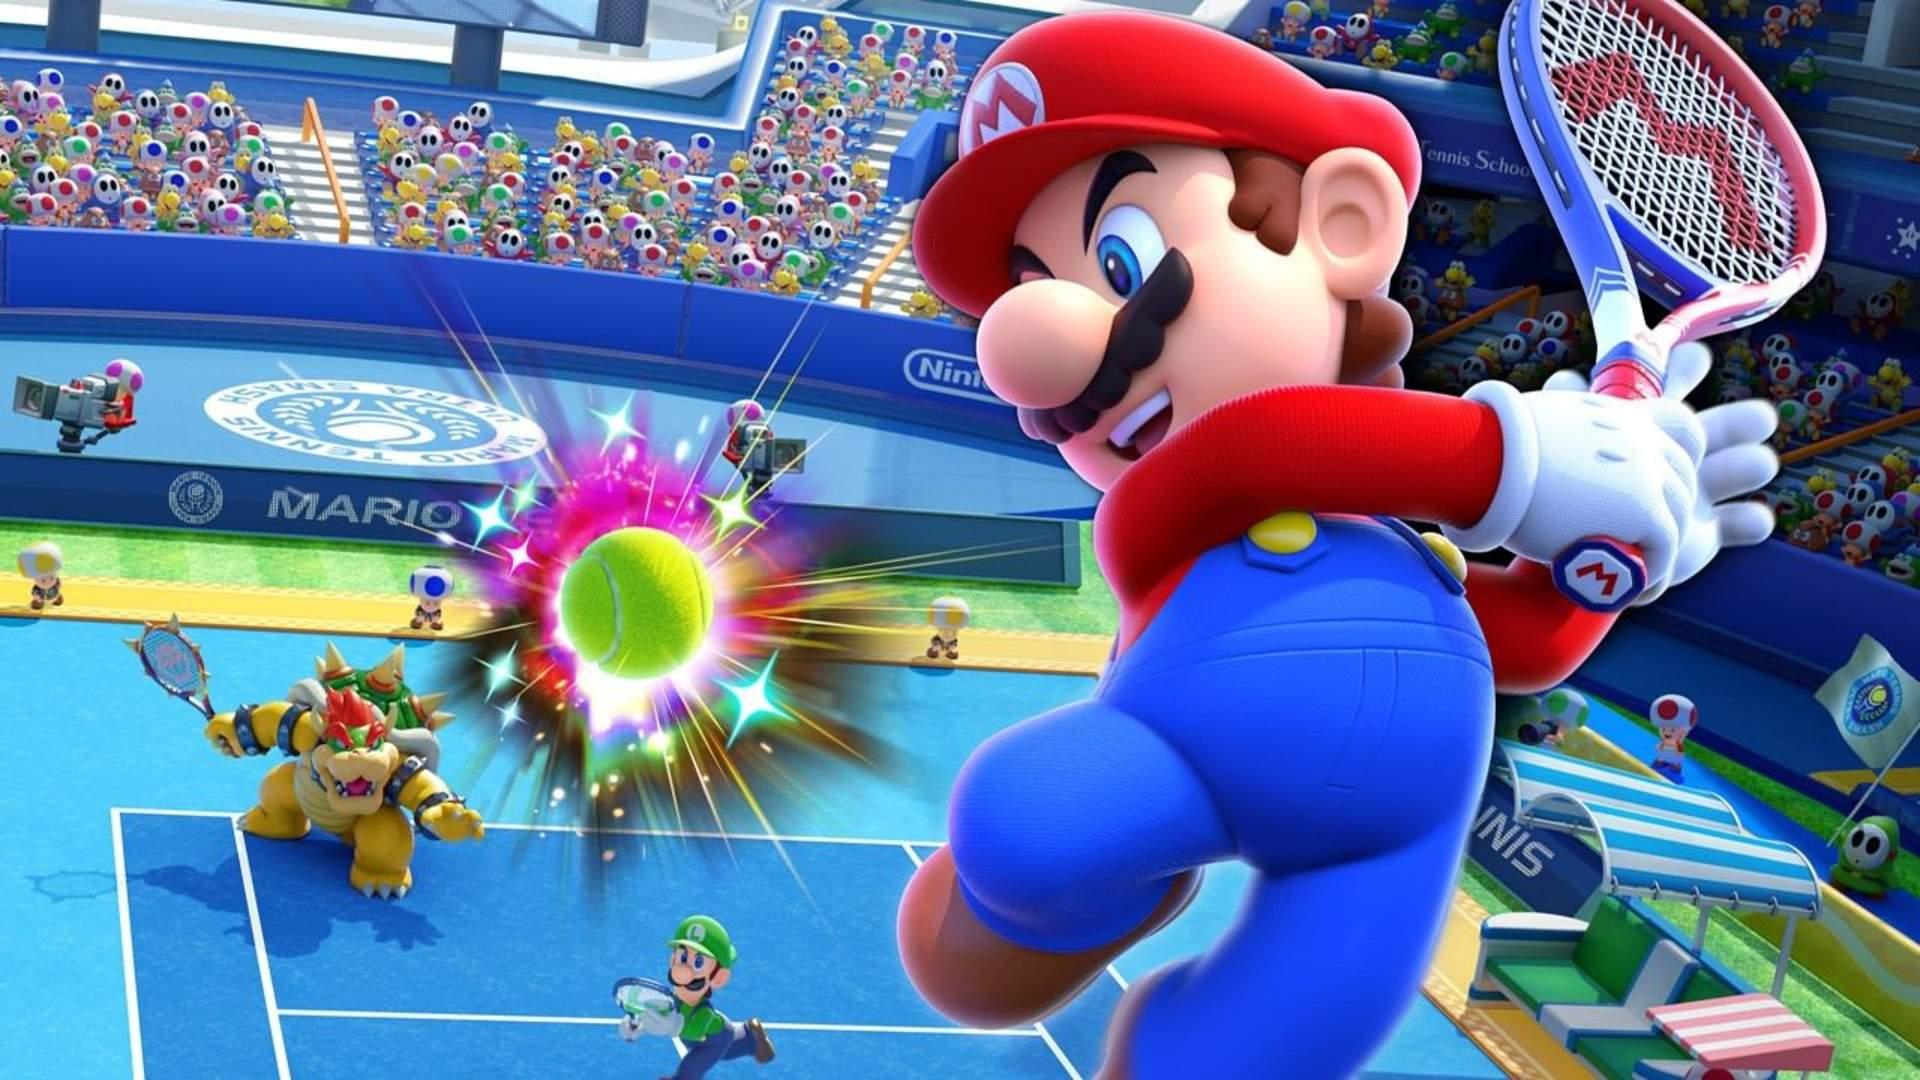 Mario Tennis Aces tournament